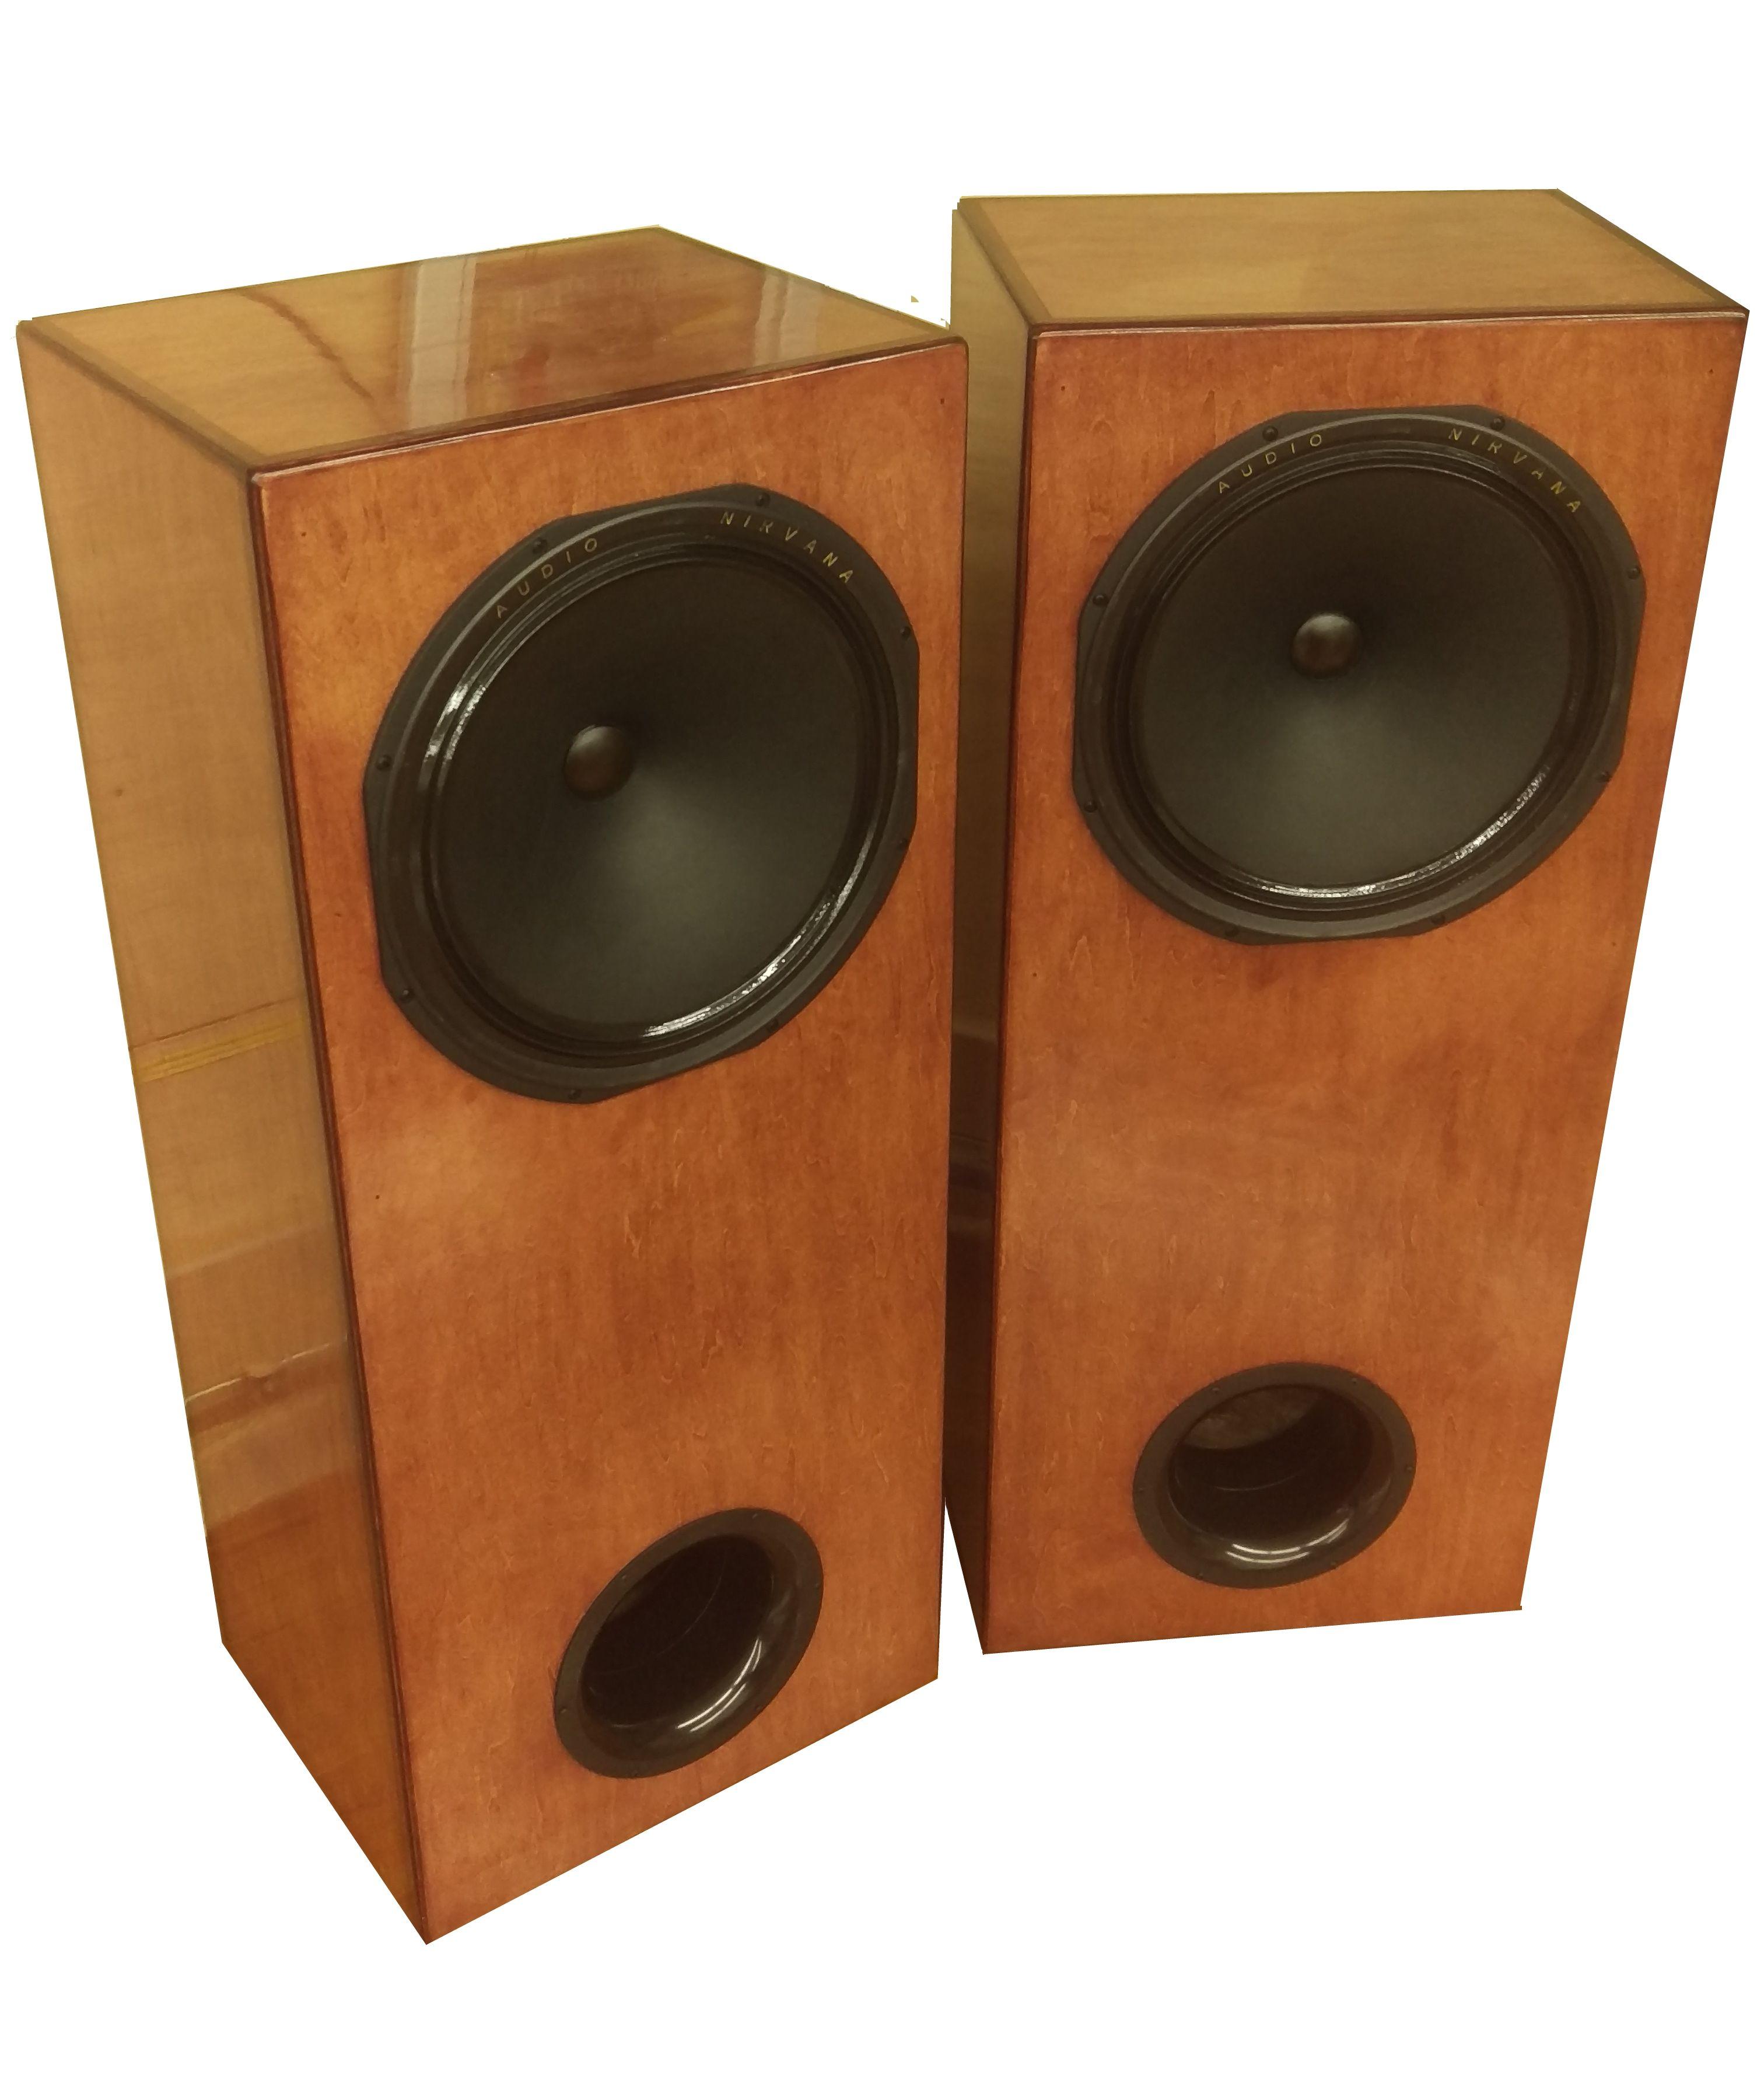 "The Audio Nirvana 5.6 Tower w/ 15"" AlNiCo Classic Drivers"